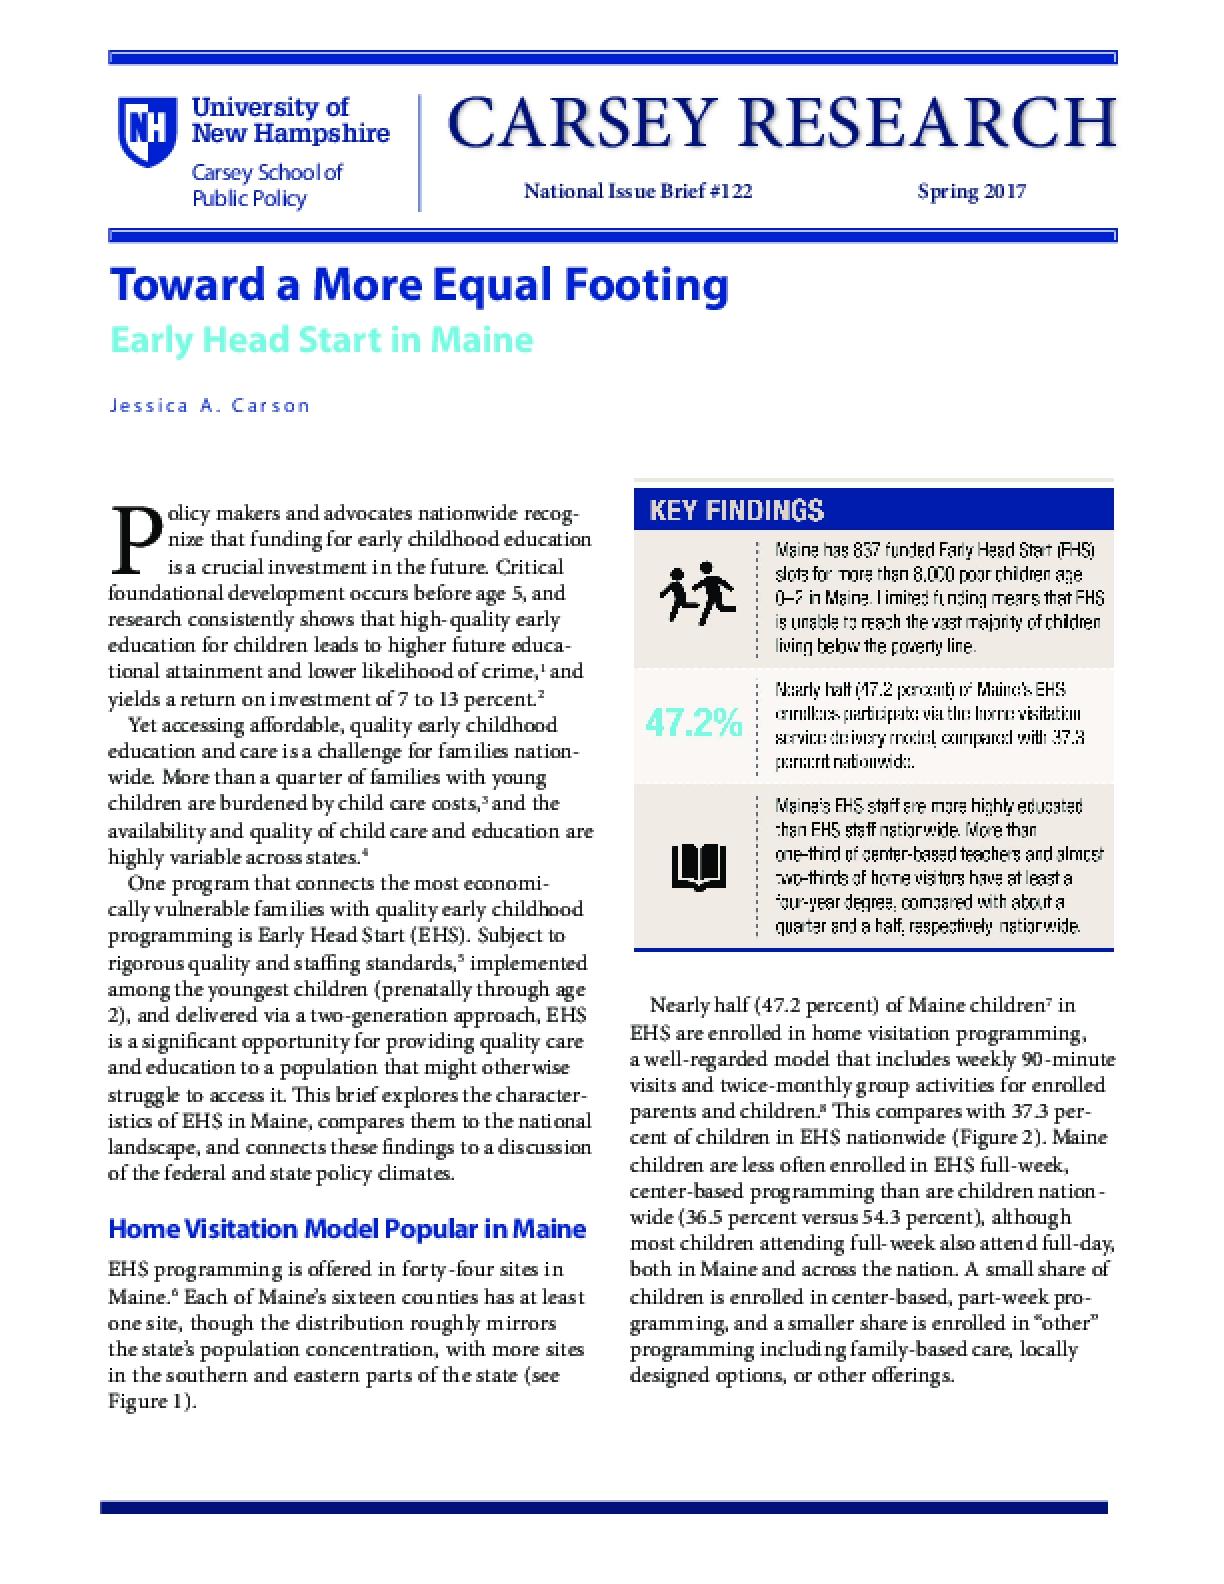 Toward a More Equal Footing